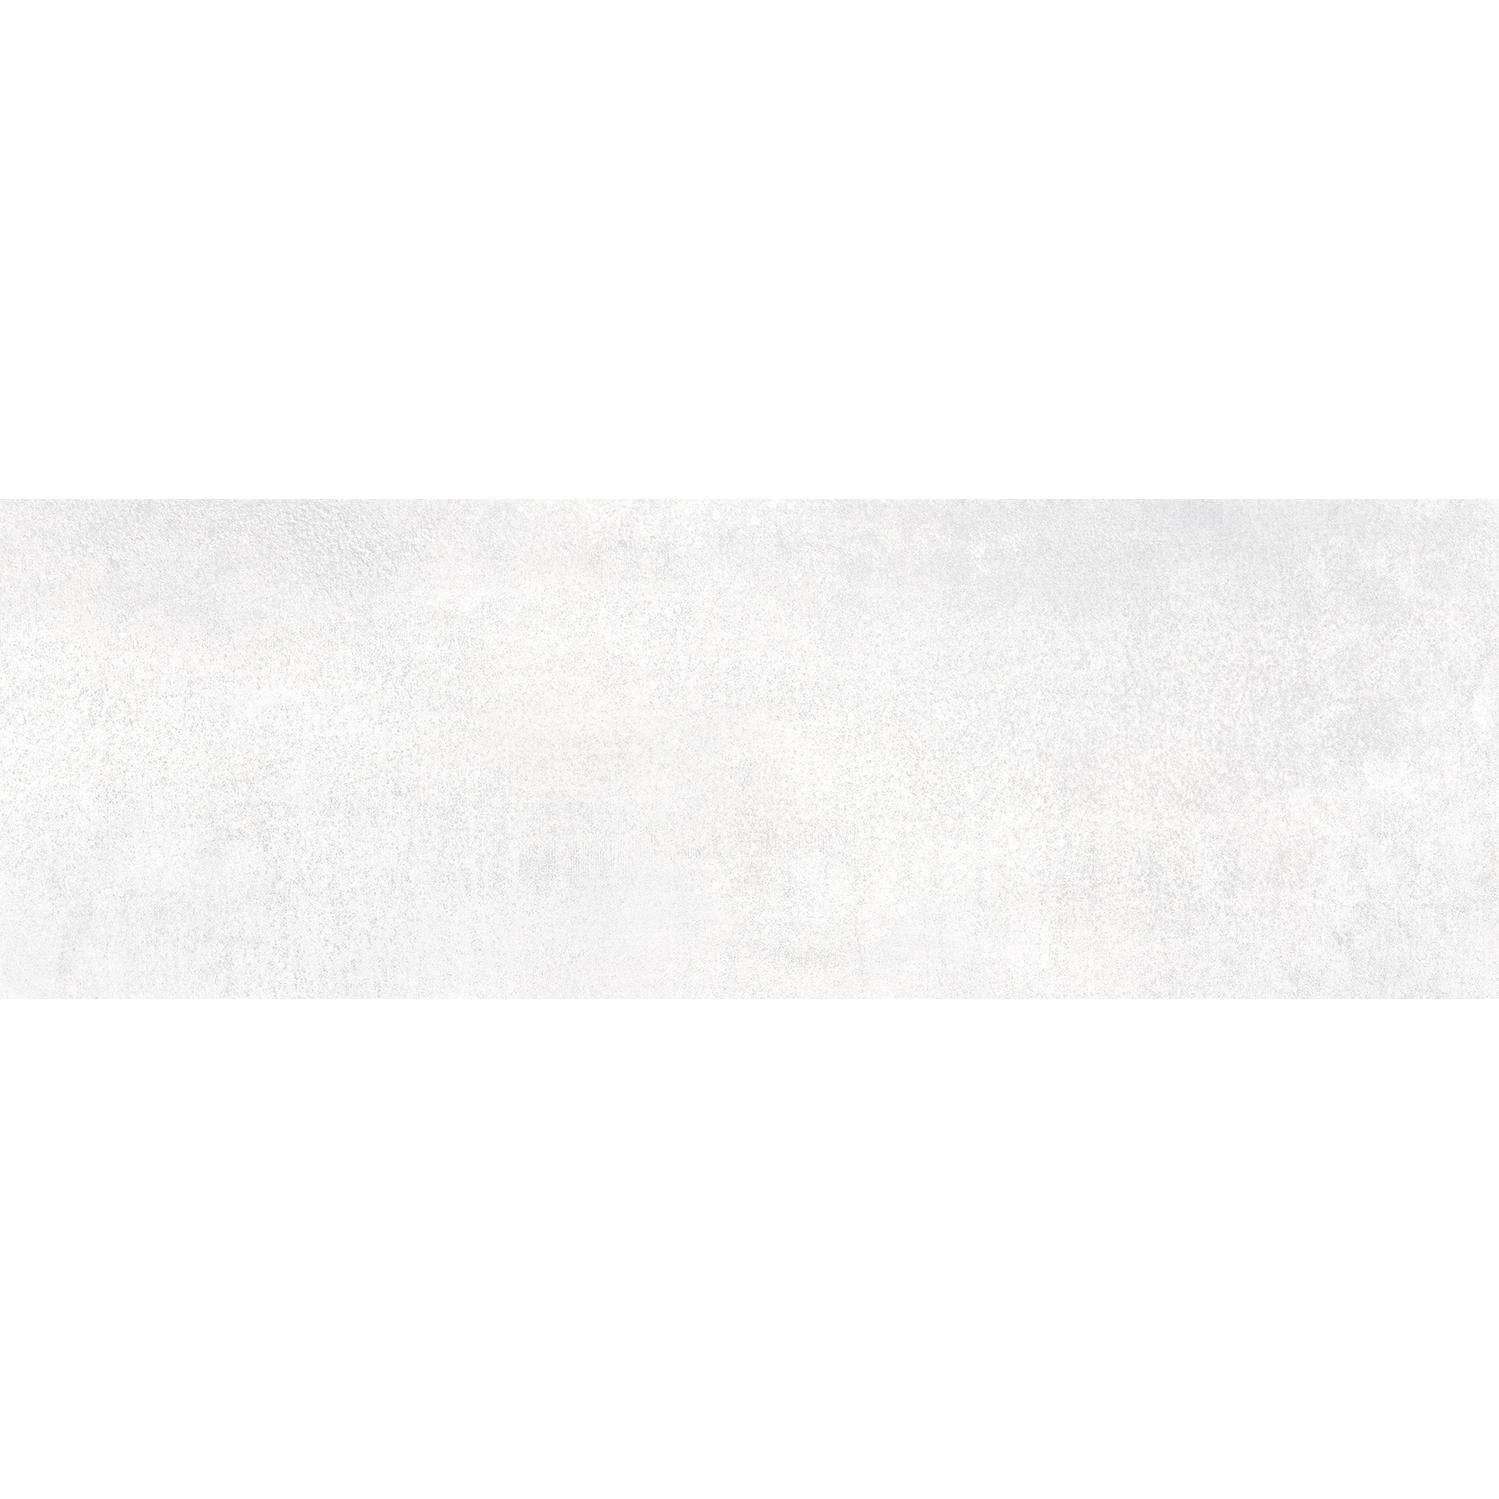 Купить Плитка Metropol Zen Beige White 30x90 см KU4PG000, Испания, белый, керамика